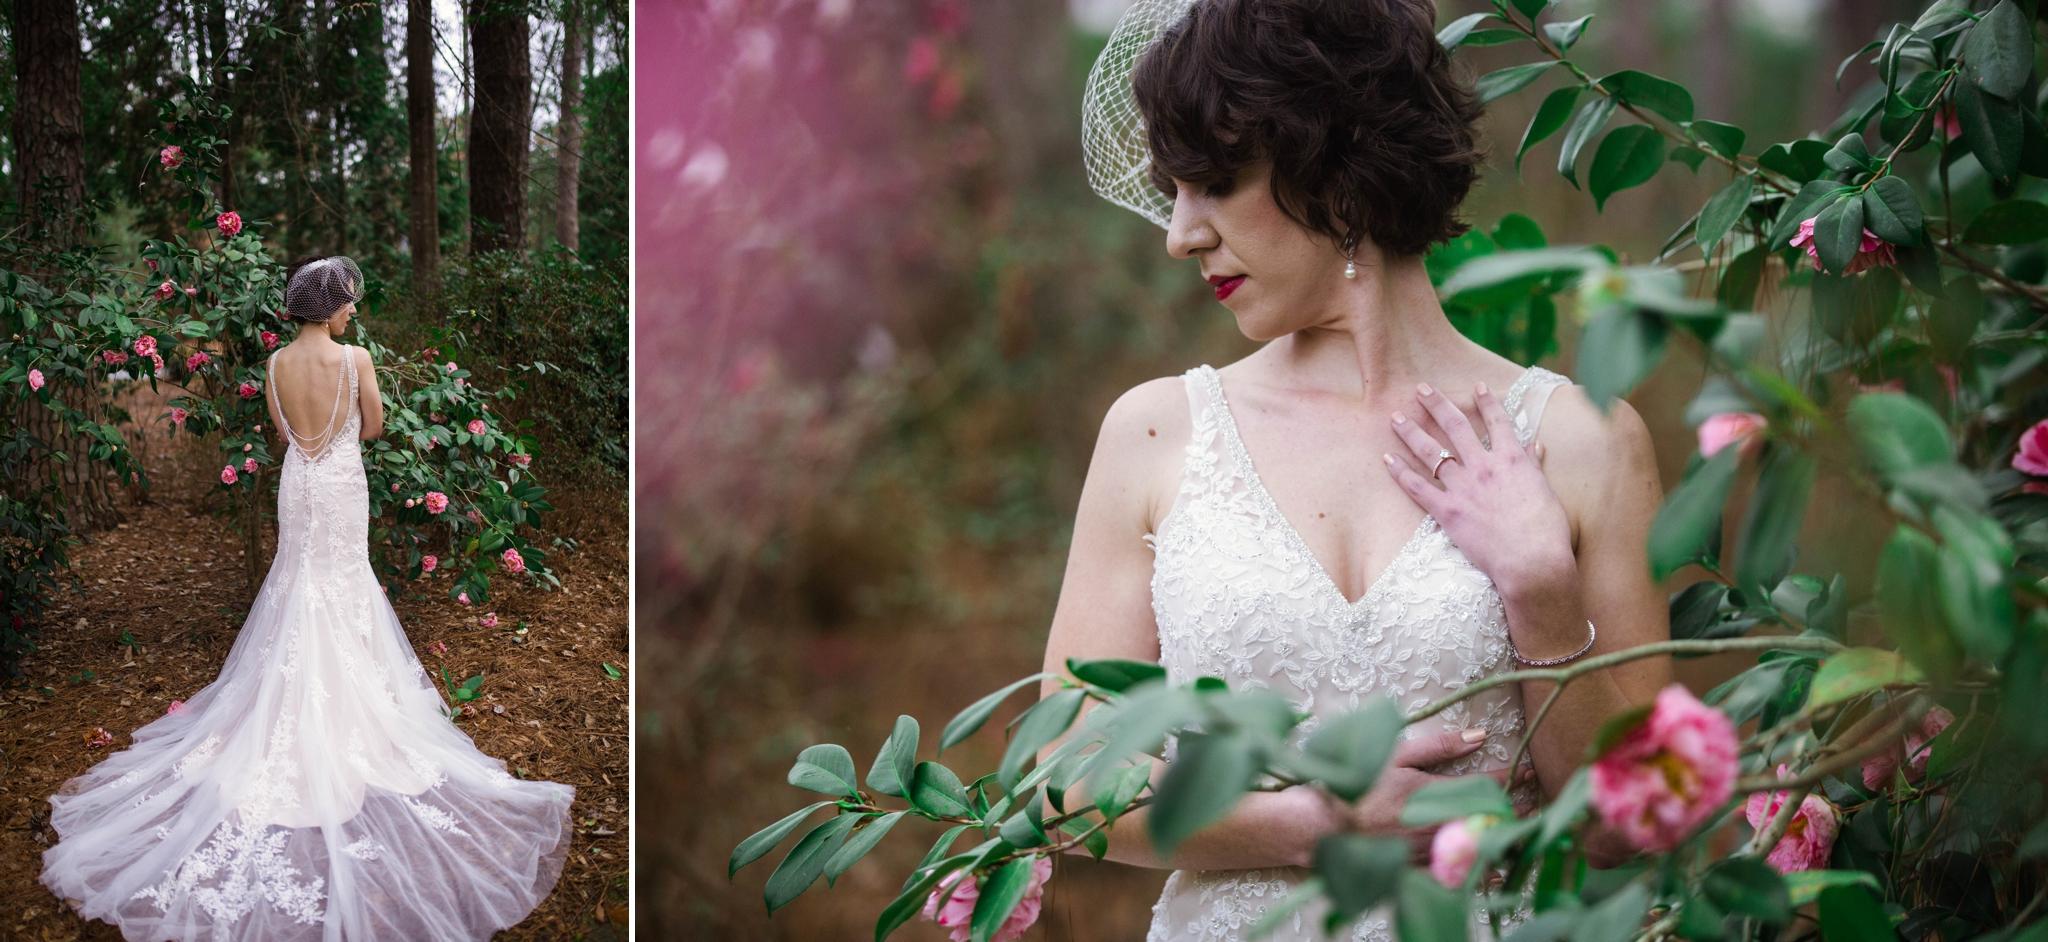 Bridal Photography Session - Raleigh North Carolina Wedding Photographer